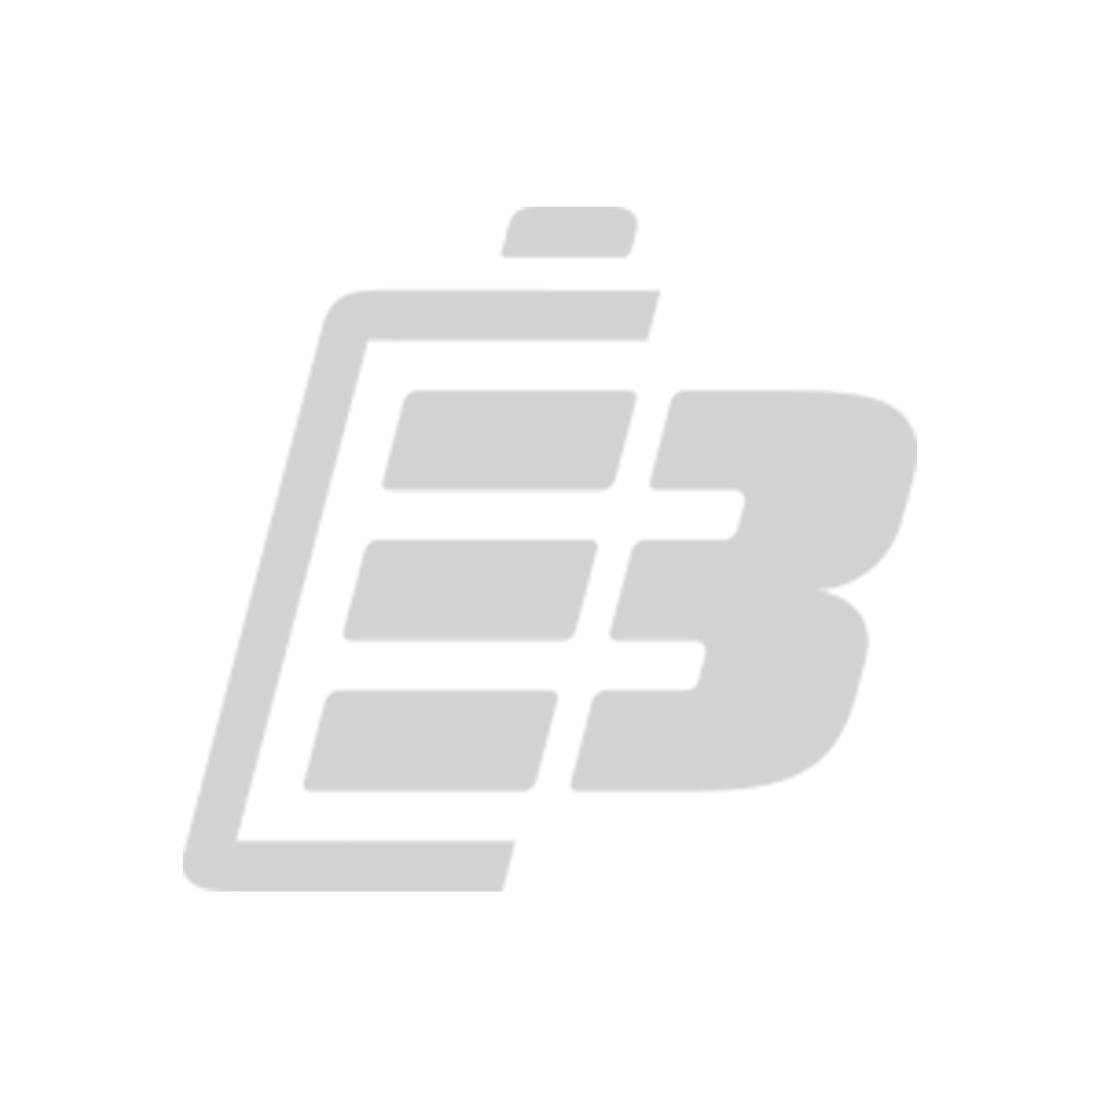 Two-Way radio battery Alinco DJ-195_1